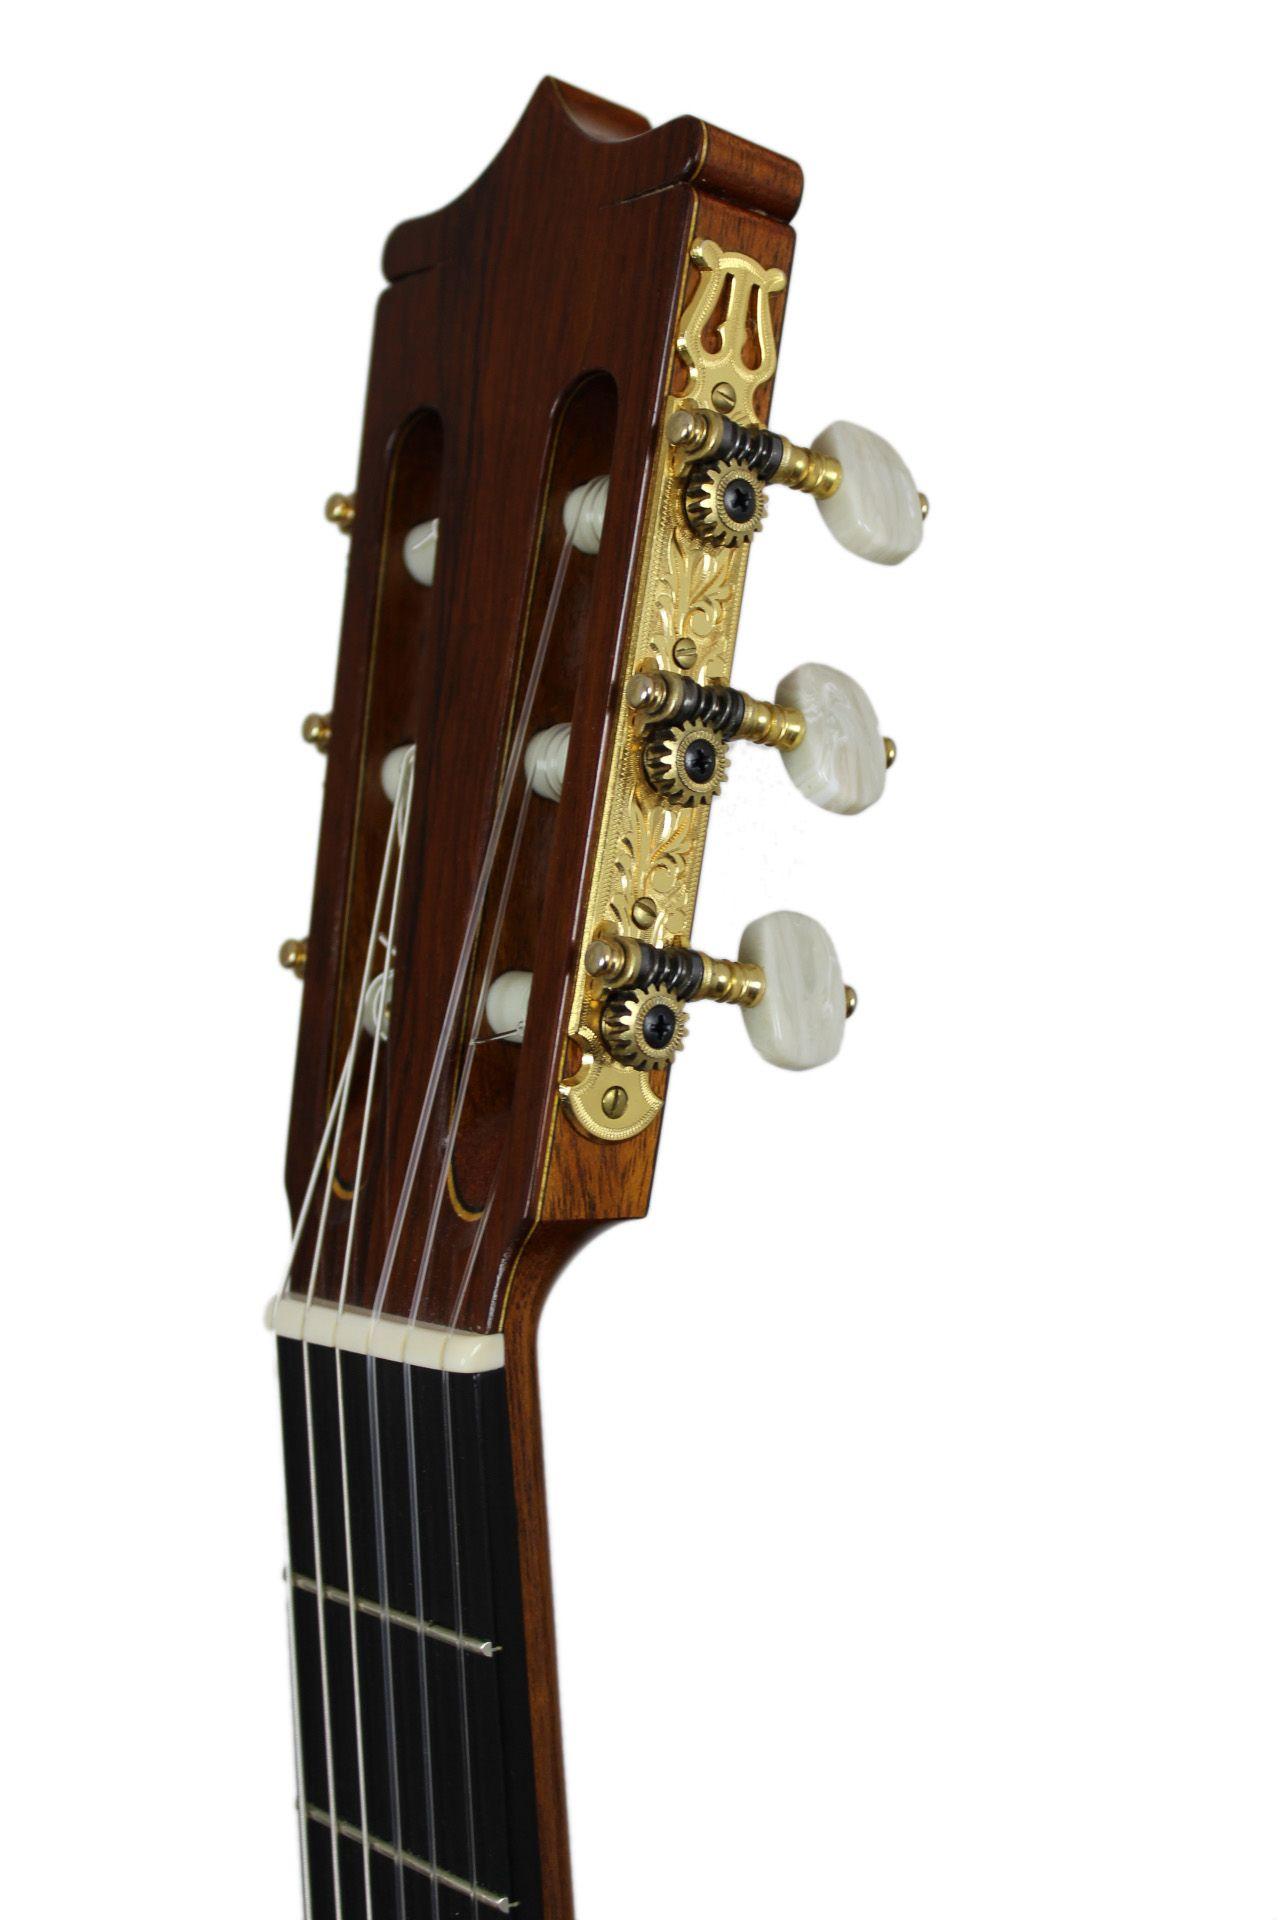 Akustische Gitarre Gropius Classical Guitar Peter O toole